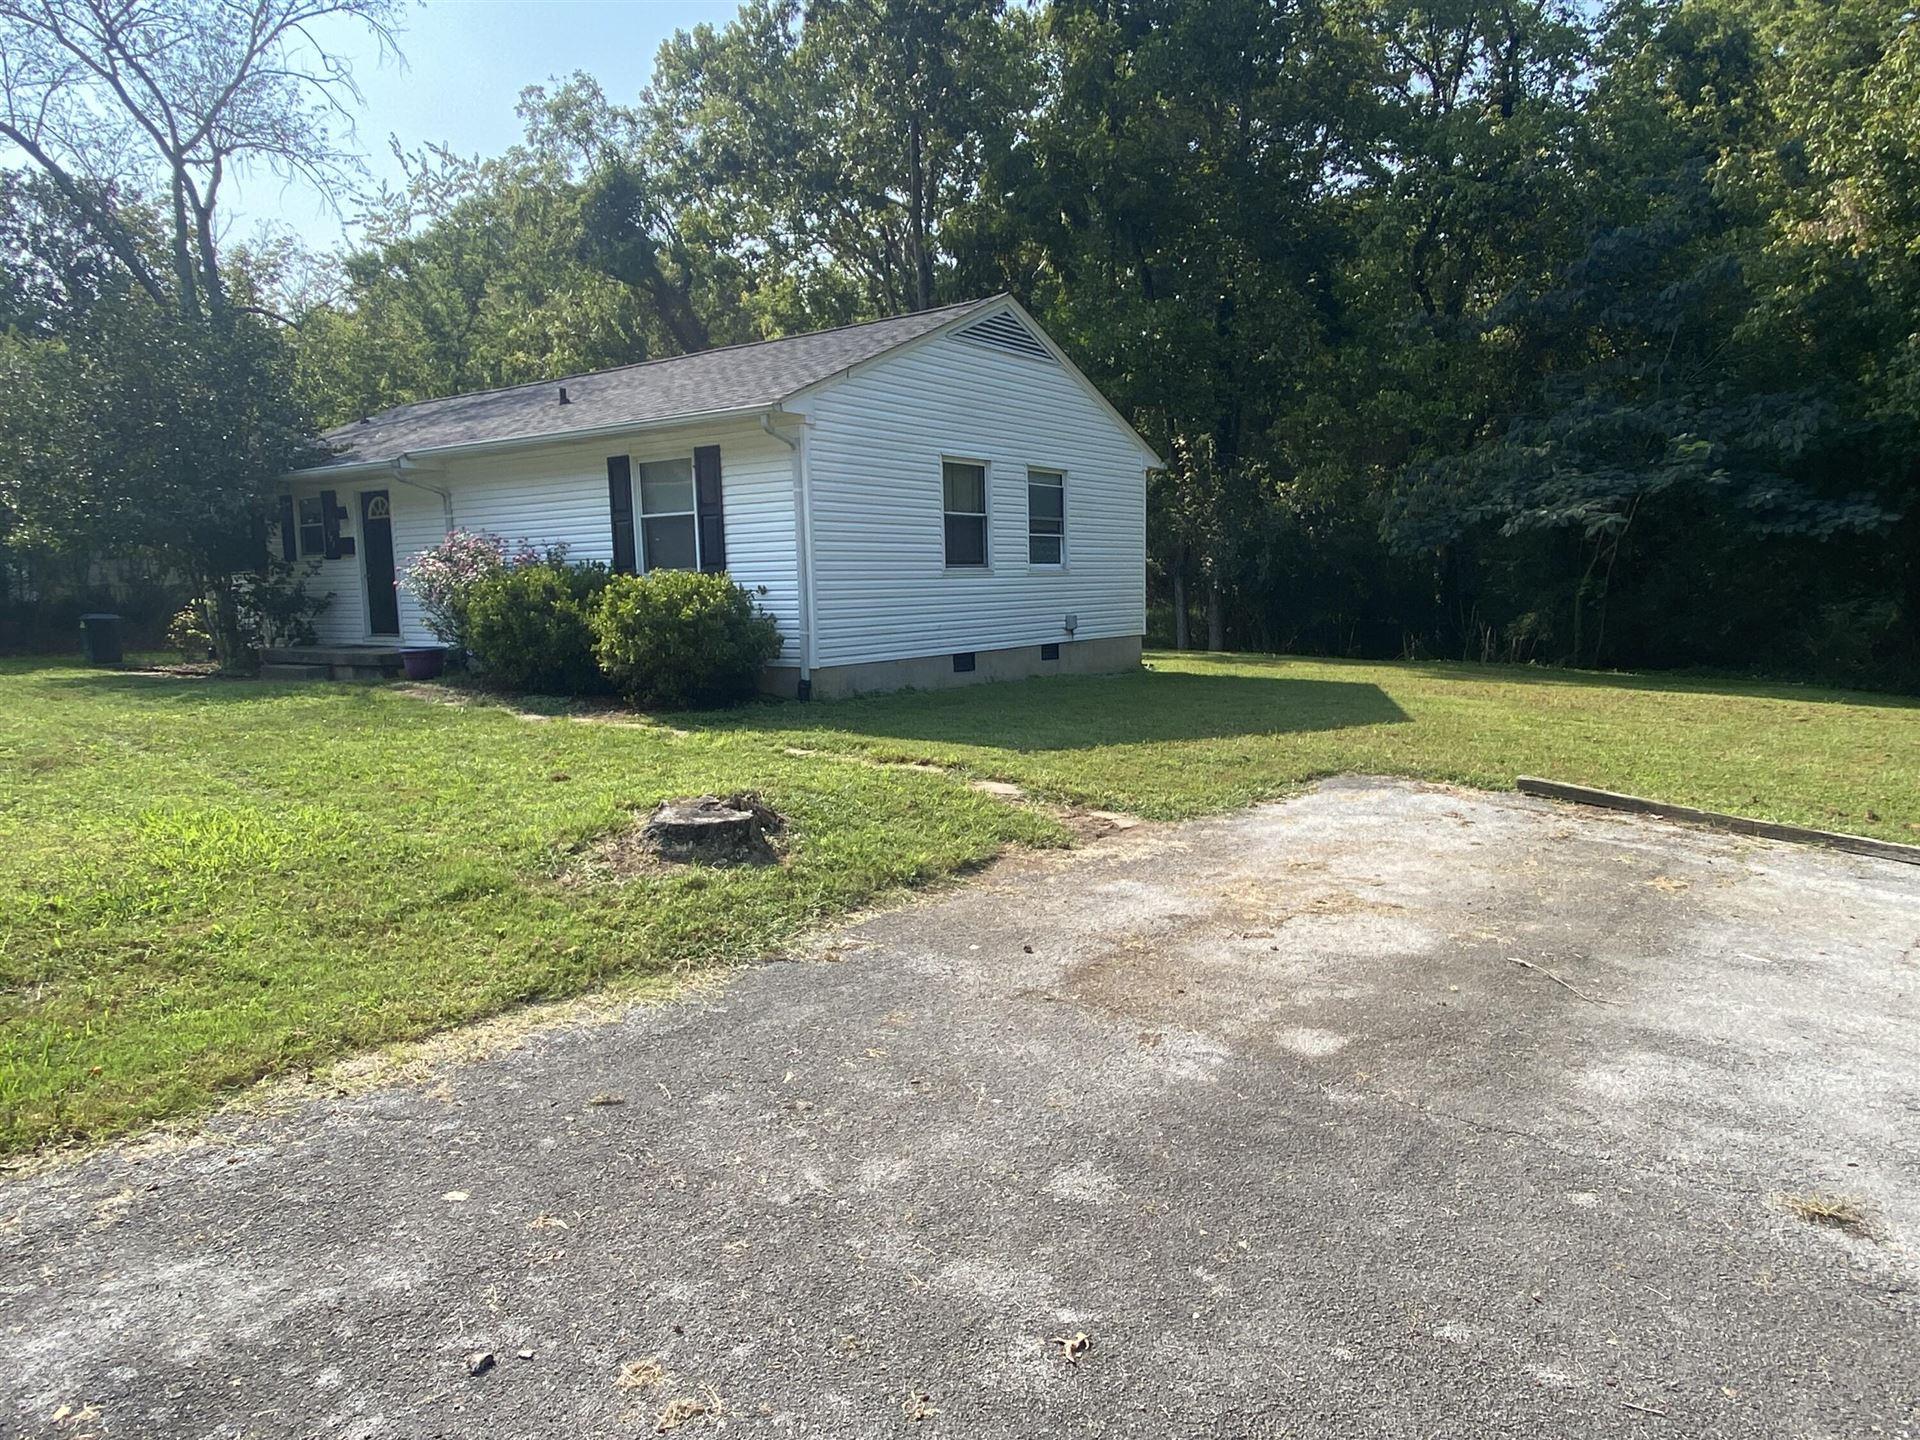 Photo of 121 Atlanta Rd, Oak Ridge, TN 37830 (MLS # 1167297)